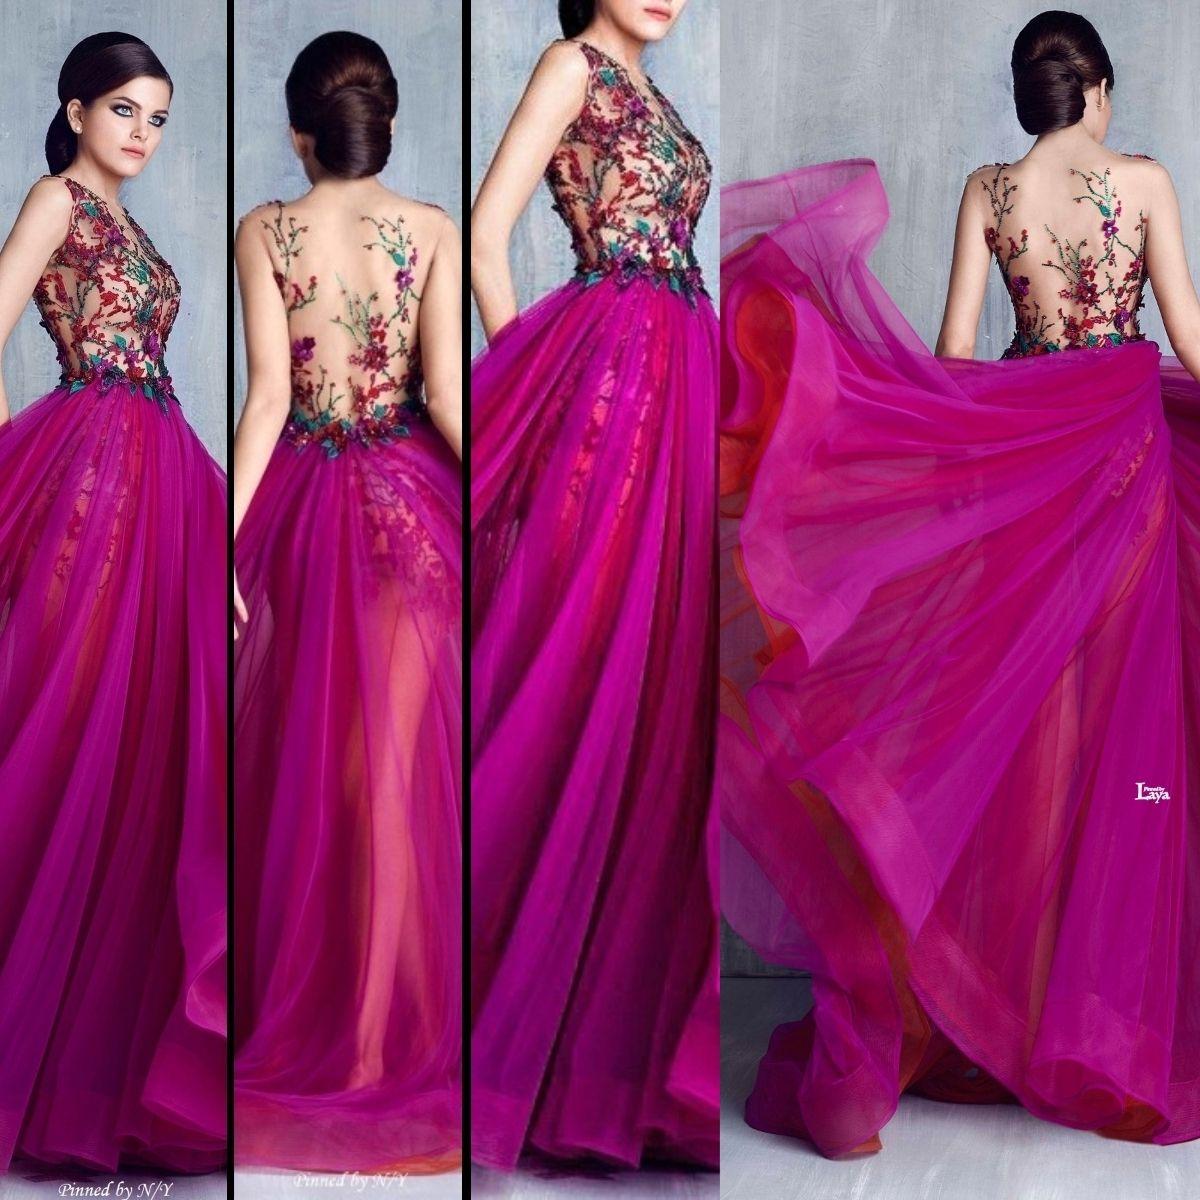 Pin de Raniah Abdullah en Dresses | Pinterest | Vestiditos ...